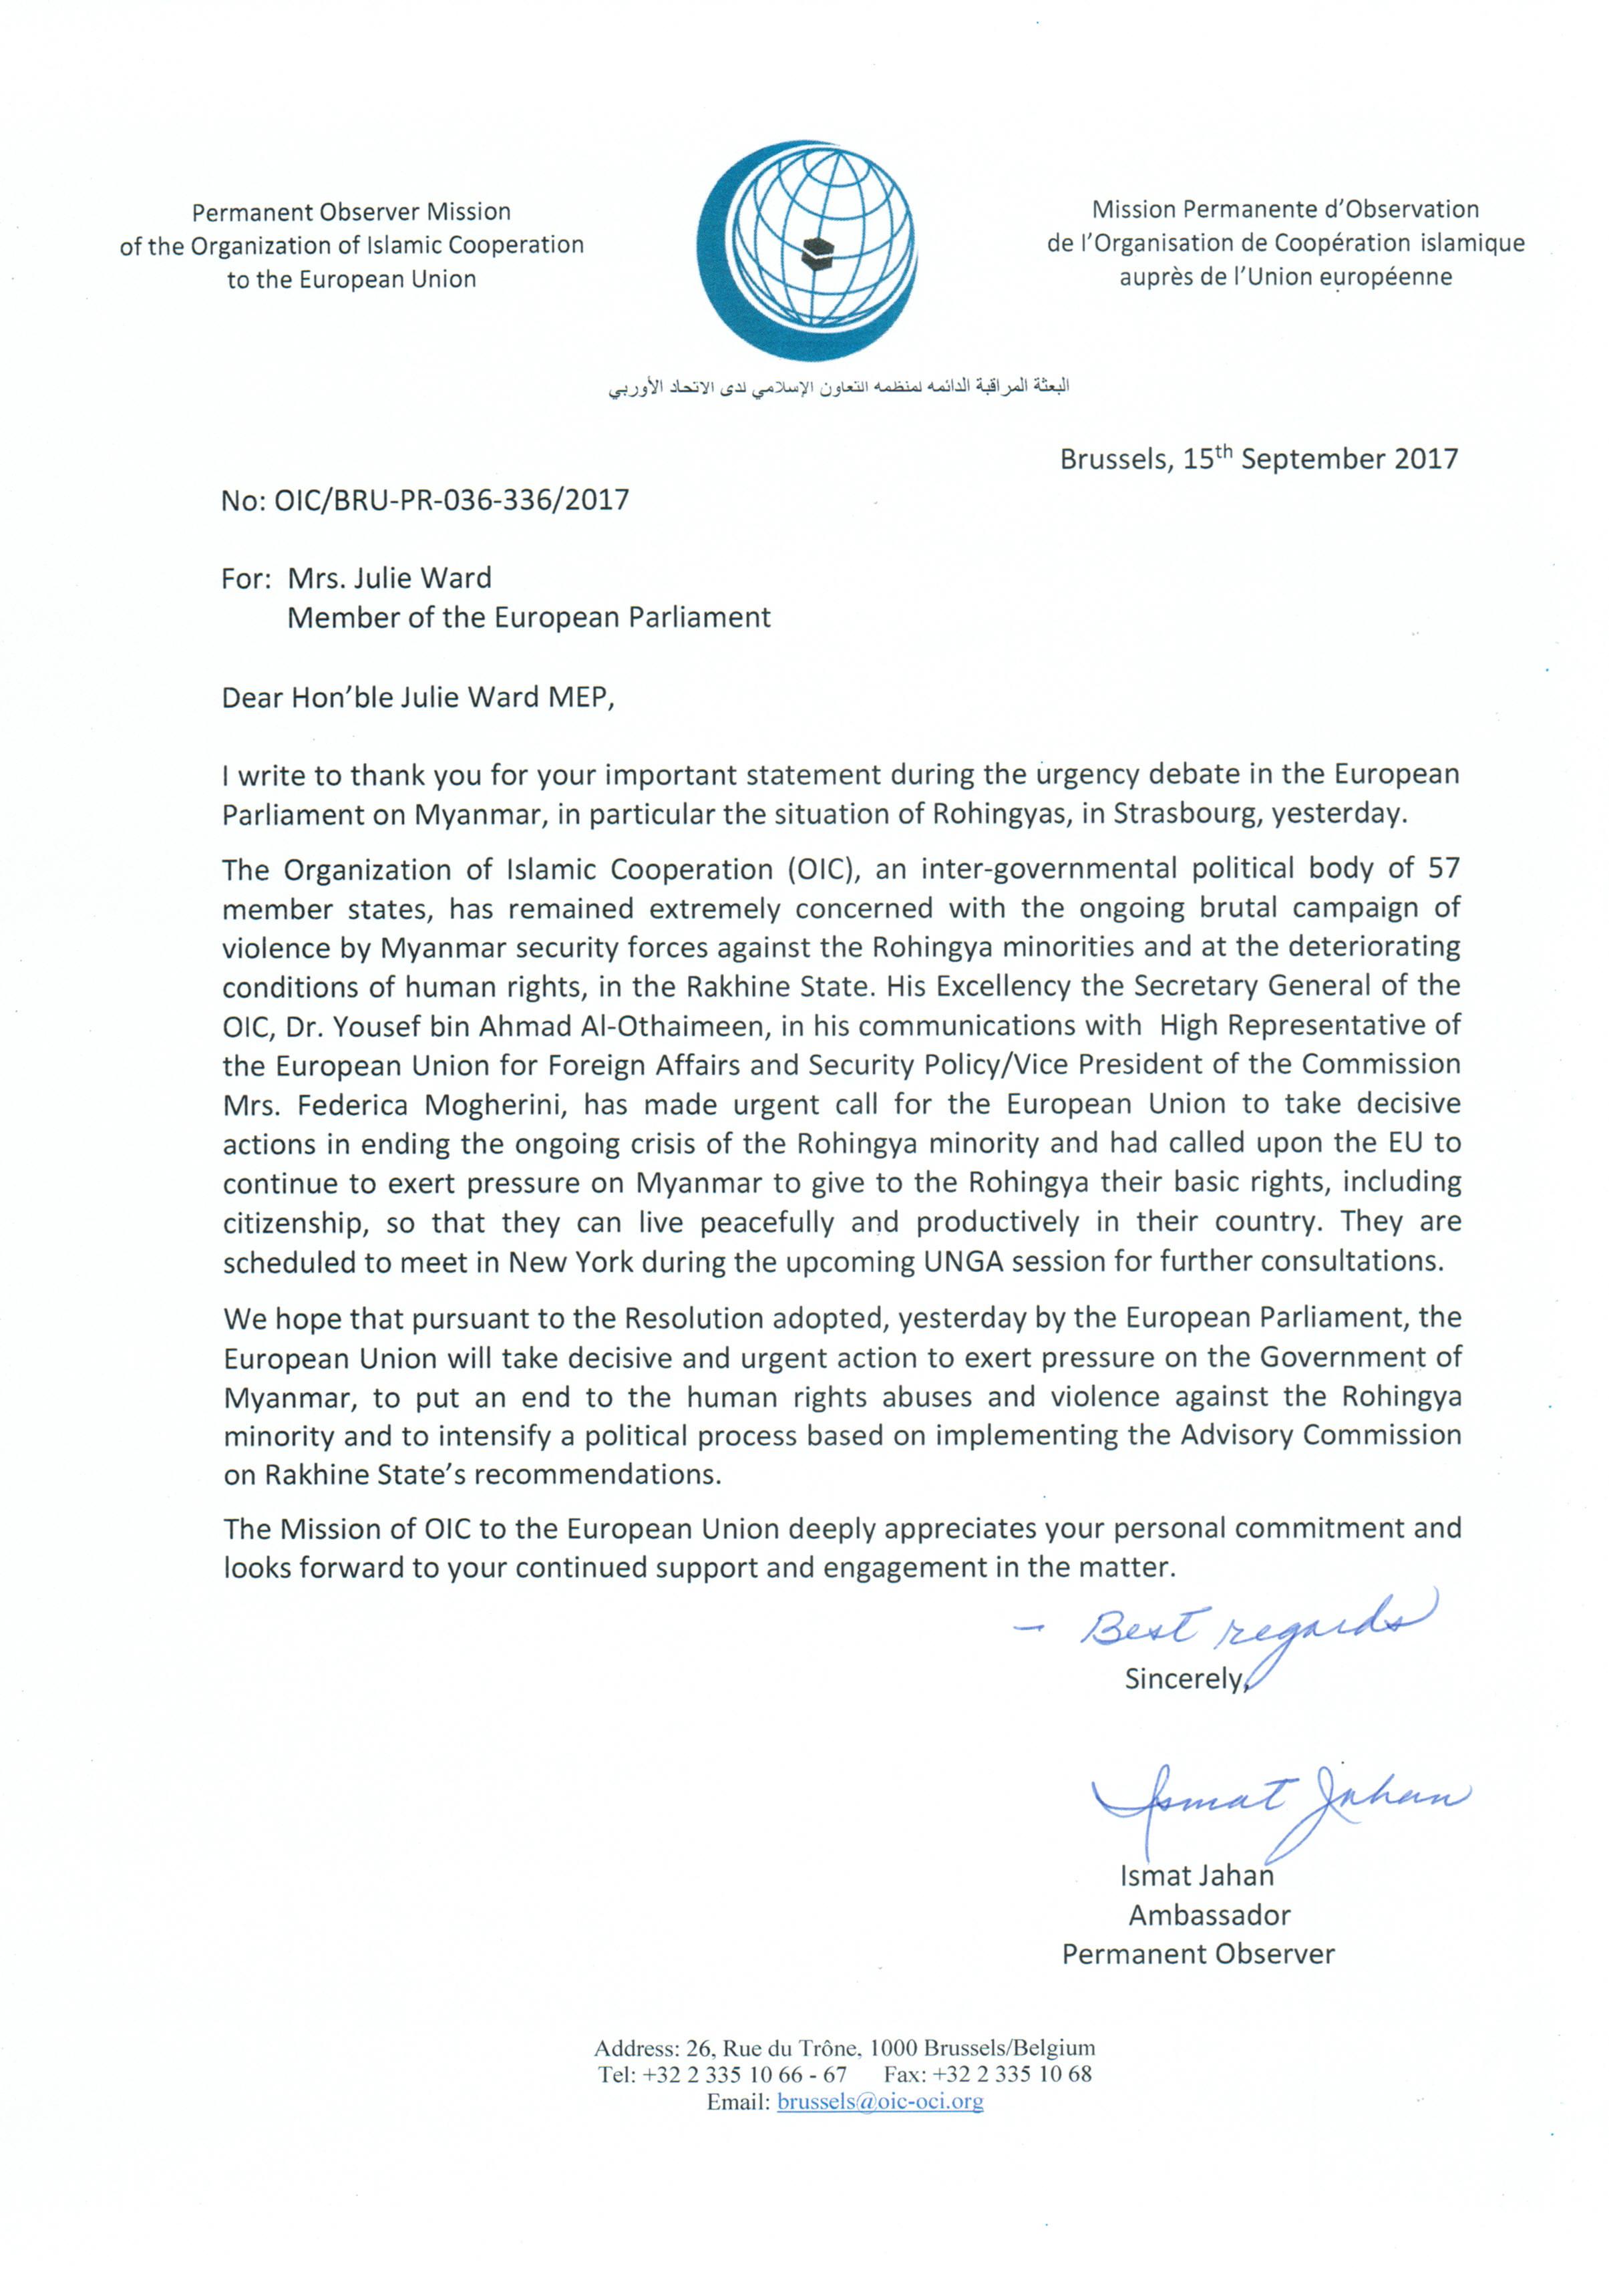 Thanking_Letter_by_Ambassador_Ismat_Jahan-11.jpg